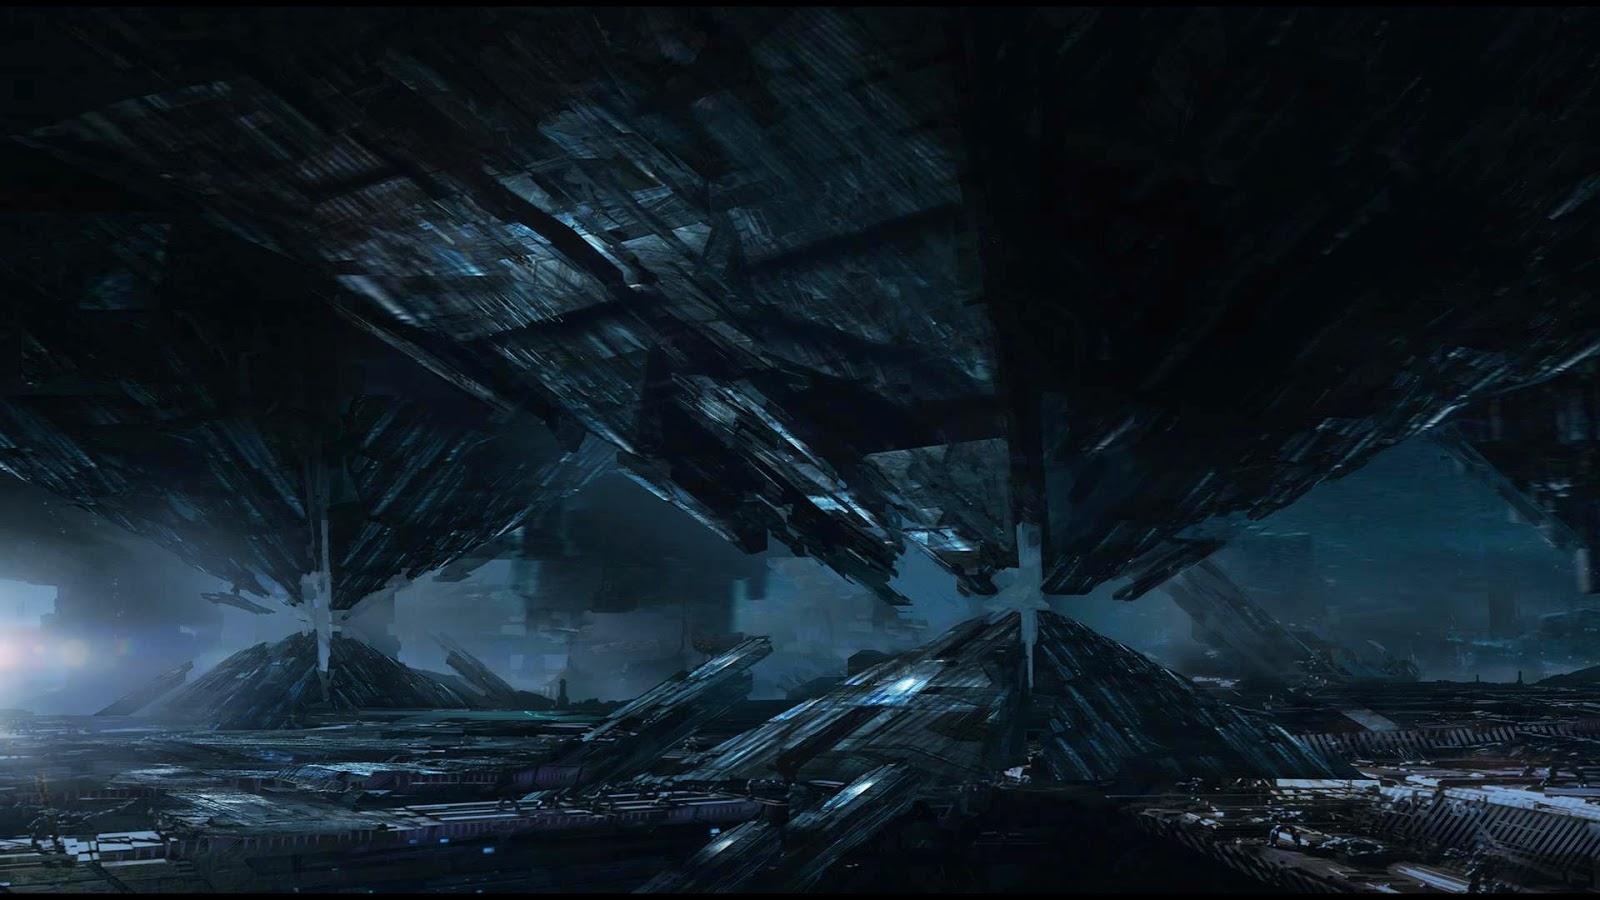 Mass effect 4 concept art post game lobby